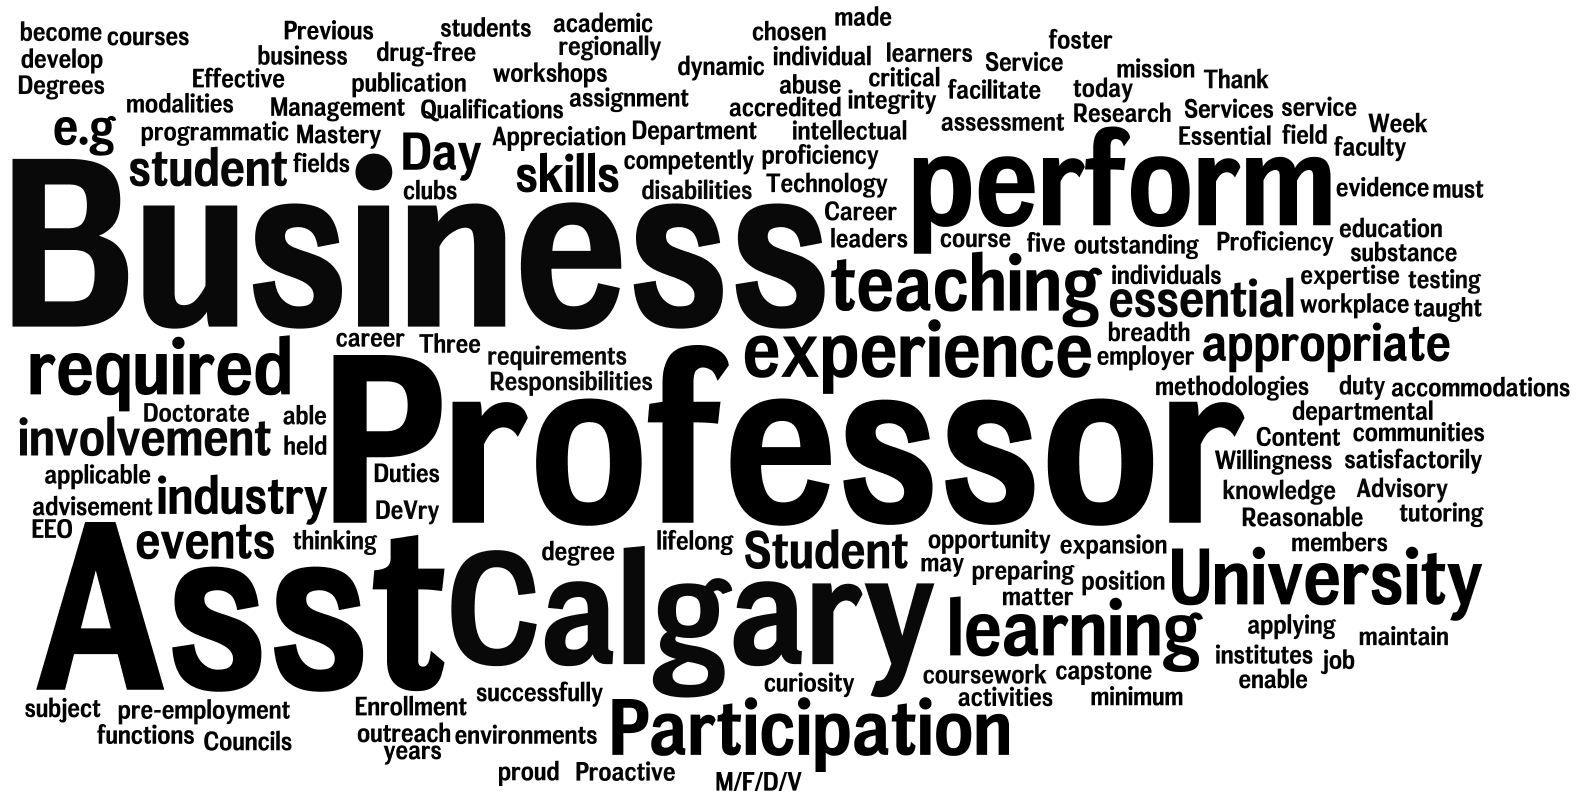 CAABCalgary Asst Professor Please send resume to